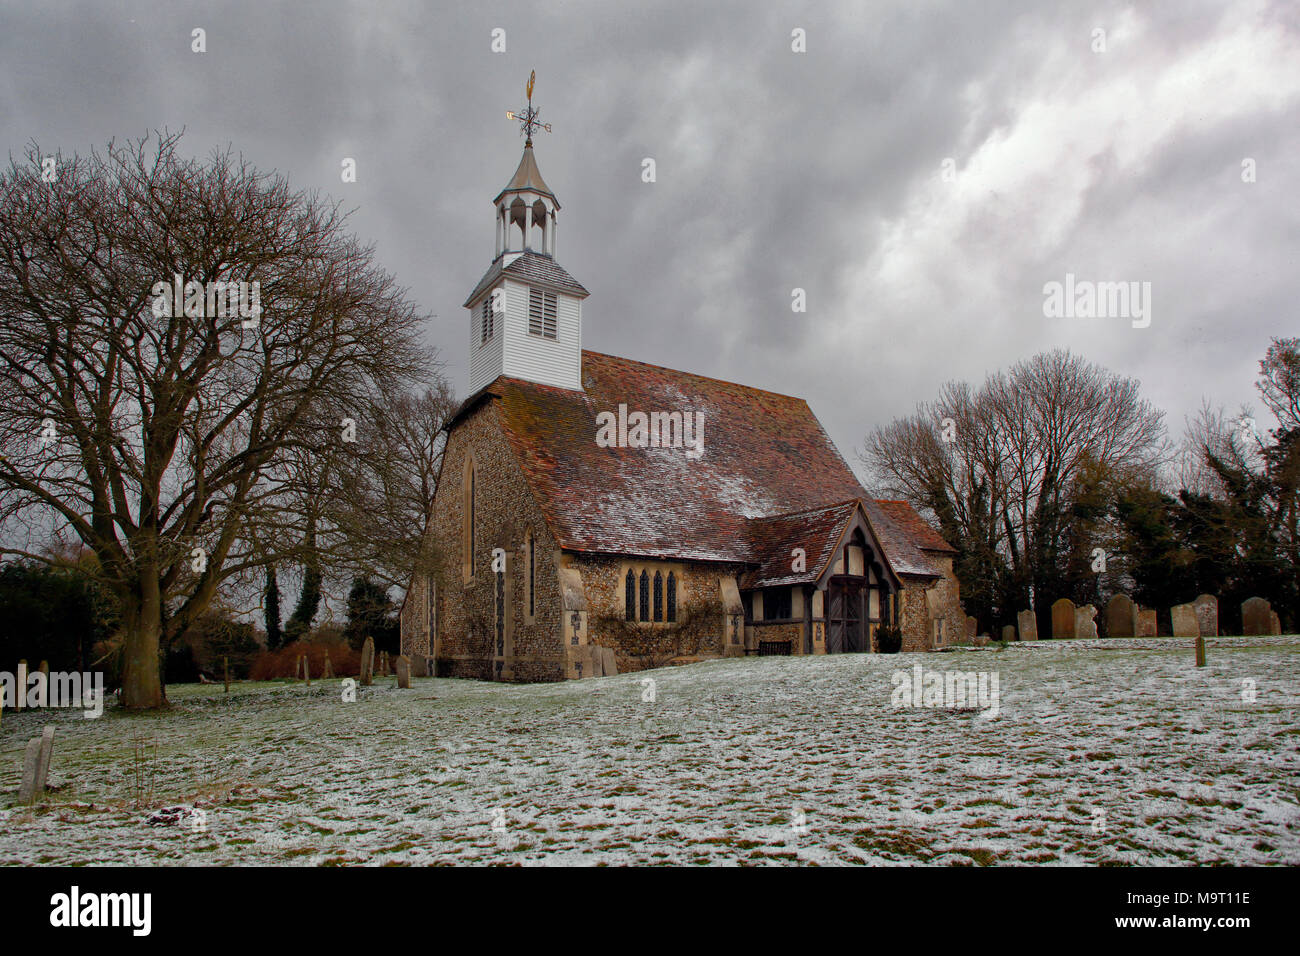 Saint Simon and Saint Jude church at Quendon, near Saffron Walden, on a snowy winter day - Stock Image